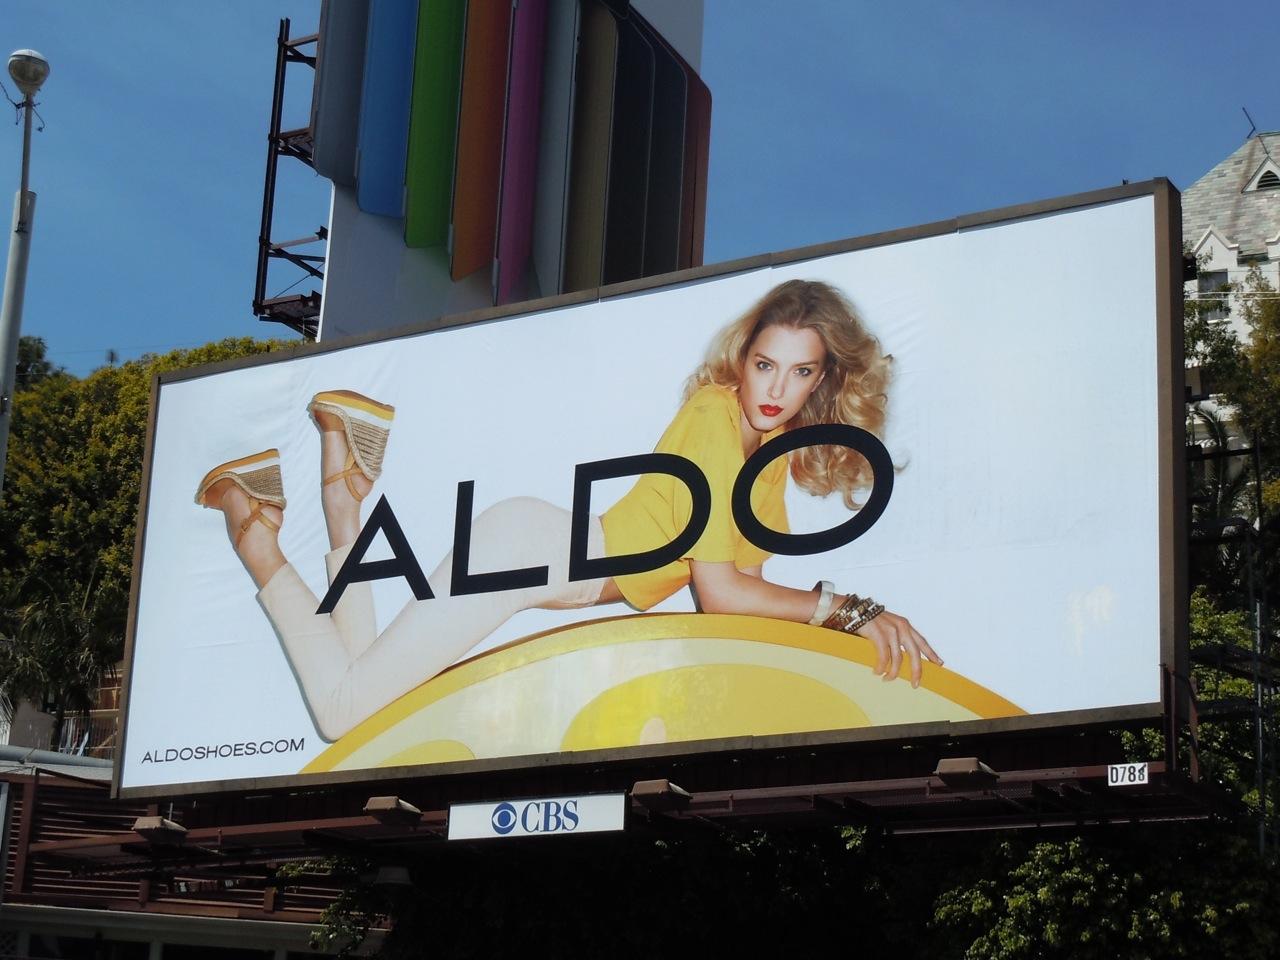 http://3.bp.blogspot.com/-juOqIjkVB8k/TnOpSAvlExI/AAAAAAAAg3U/LJnsvEEP8jg/s1600/yellow%2BAldo%2Bshoes%2Bbillboard.jpg